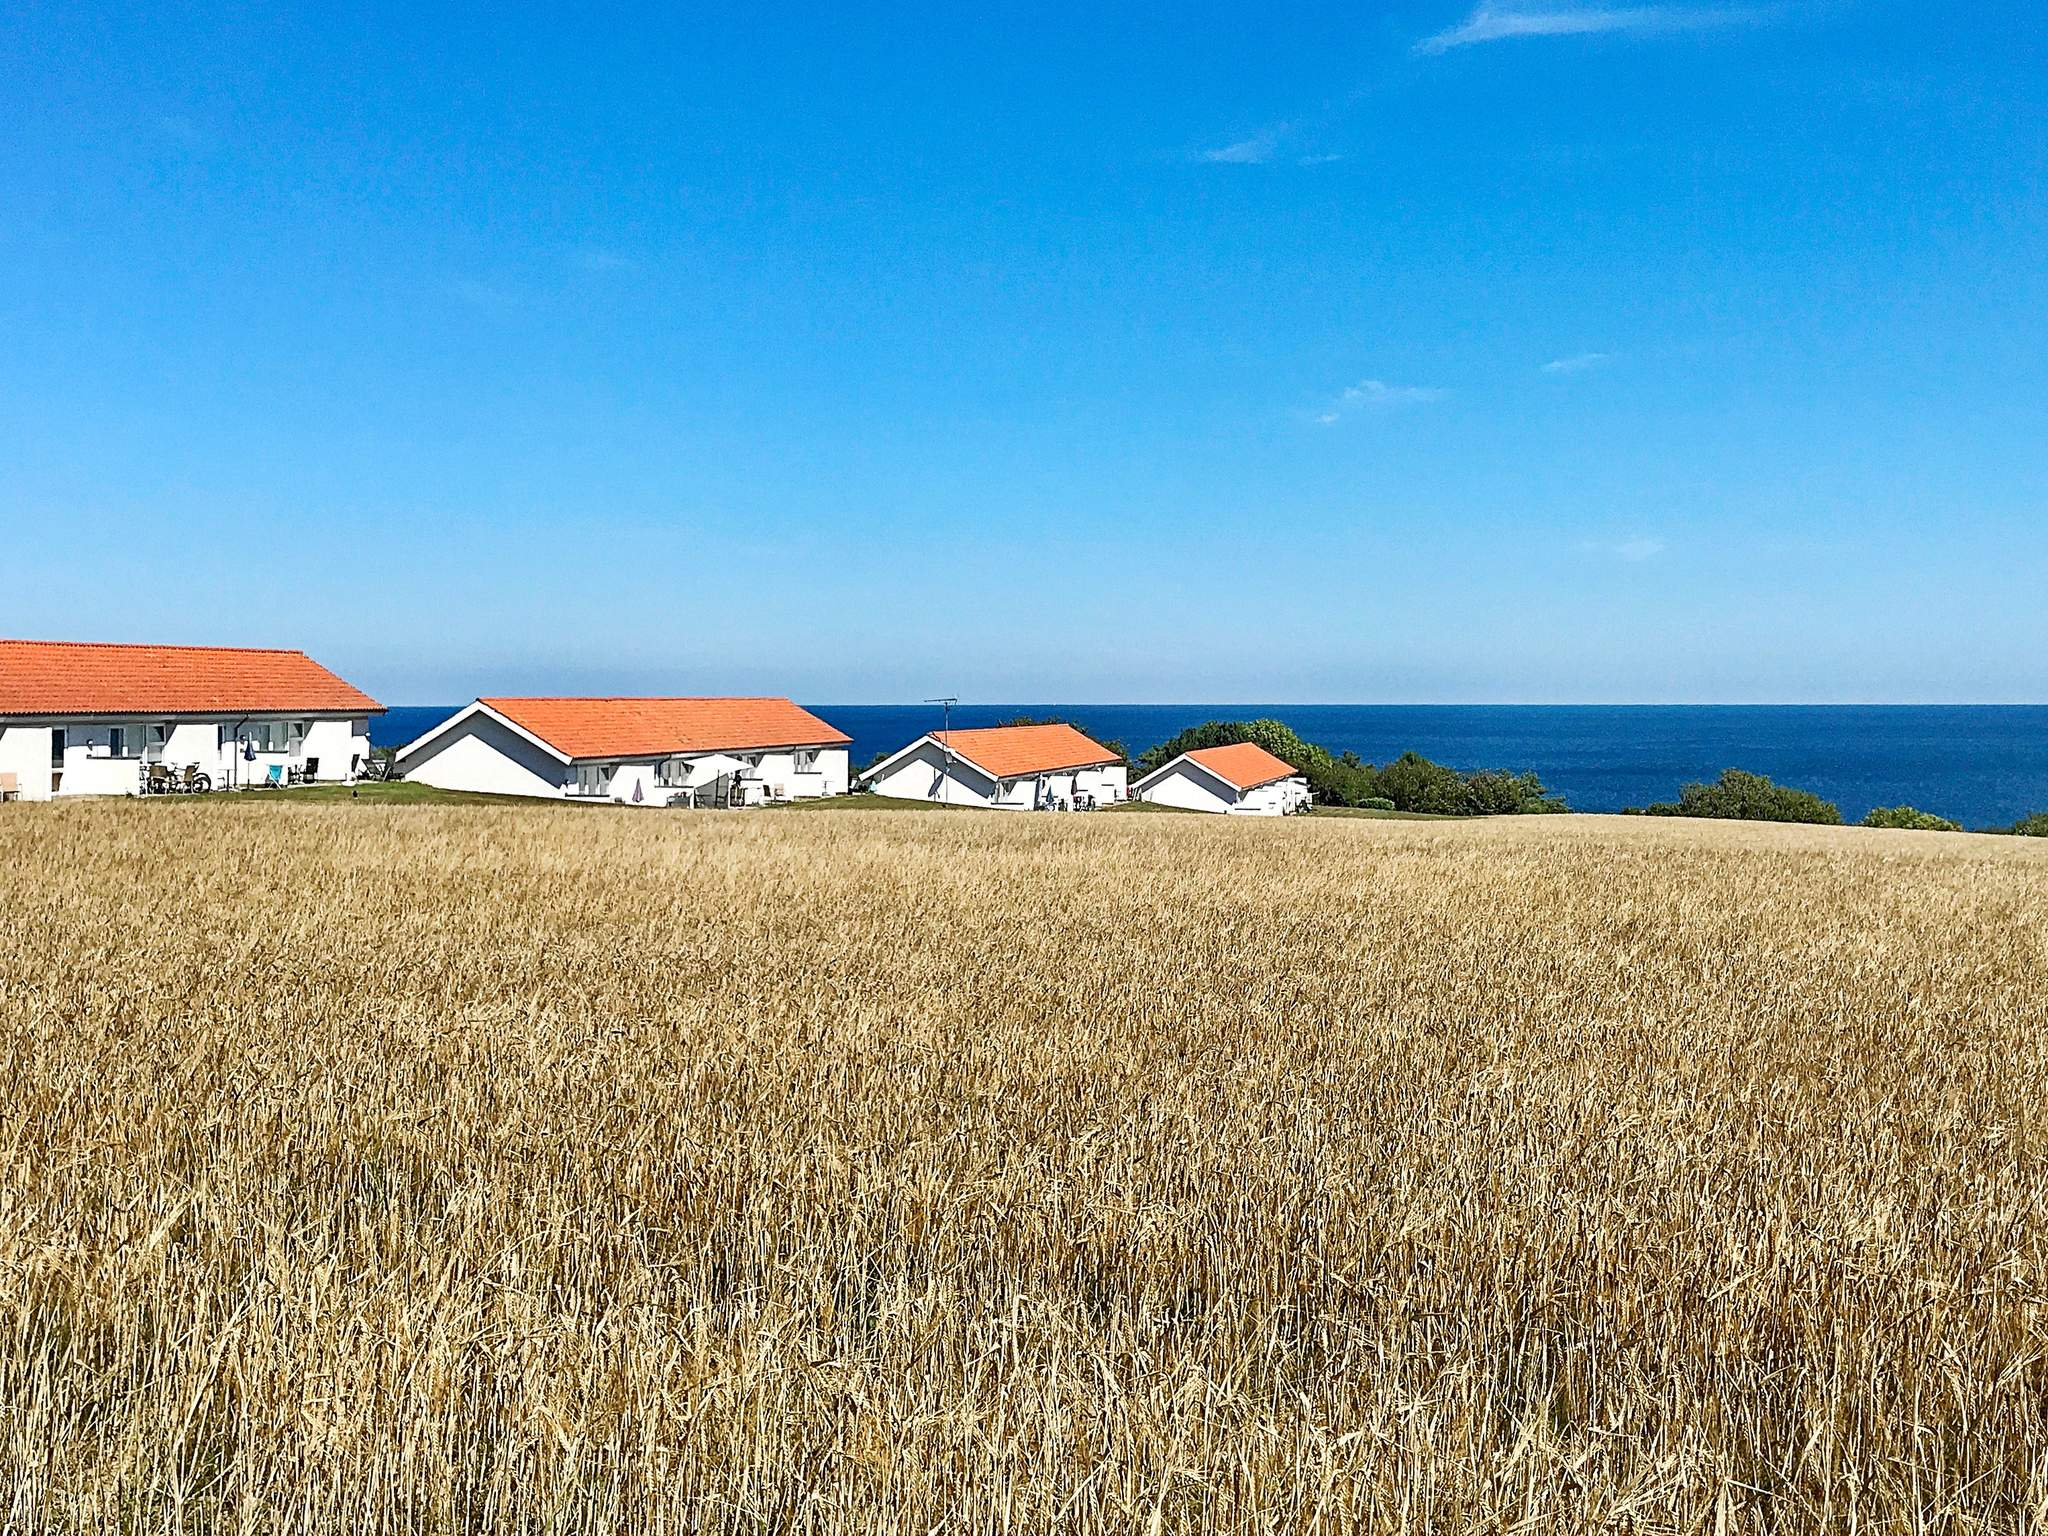 Ferienwohnung Sandkås (259917), Sandkås, , Bornholm, Dänemark, Bild 11